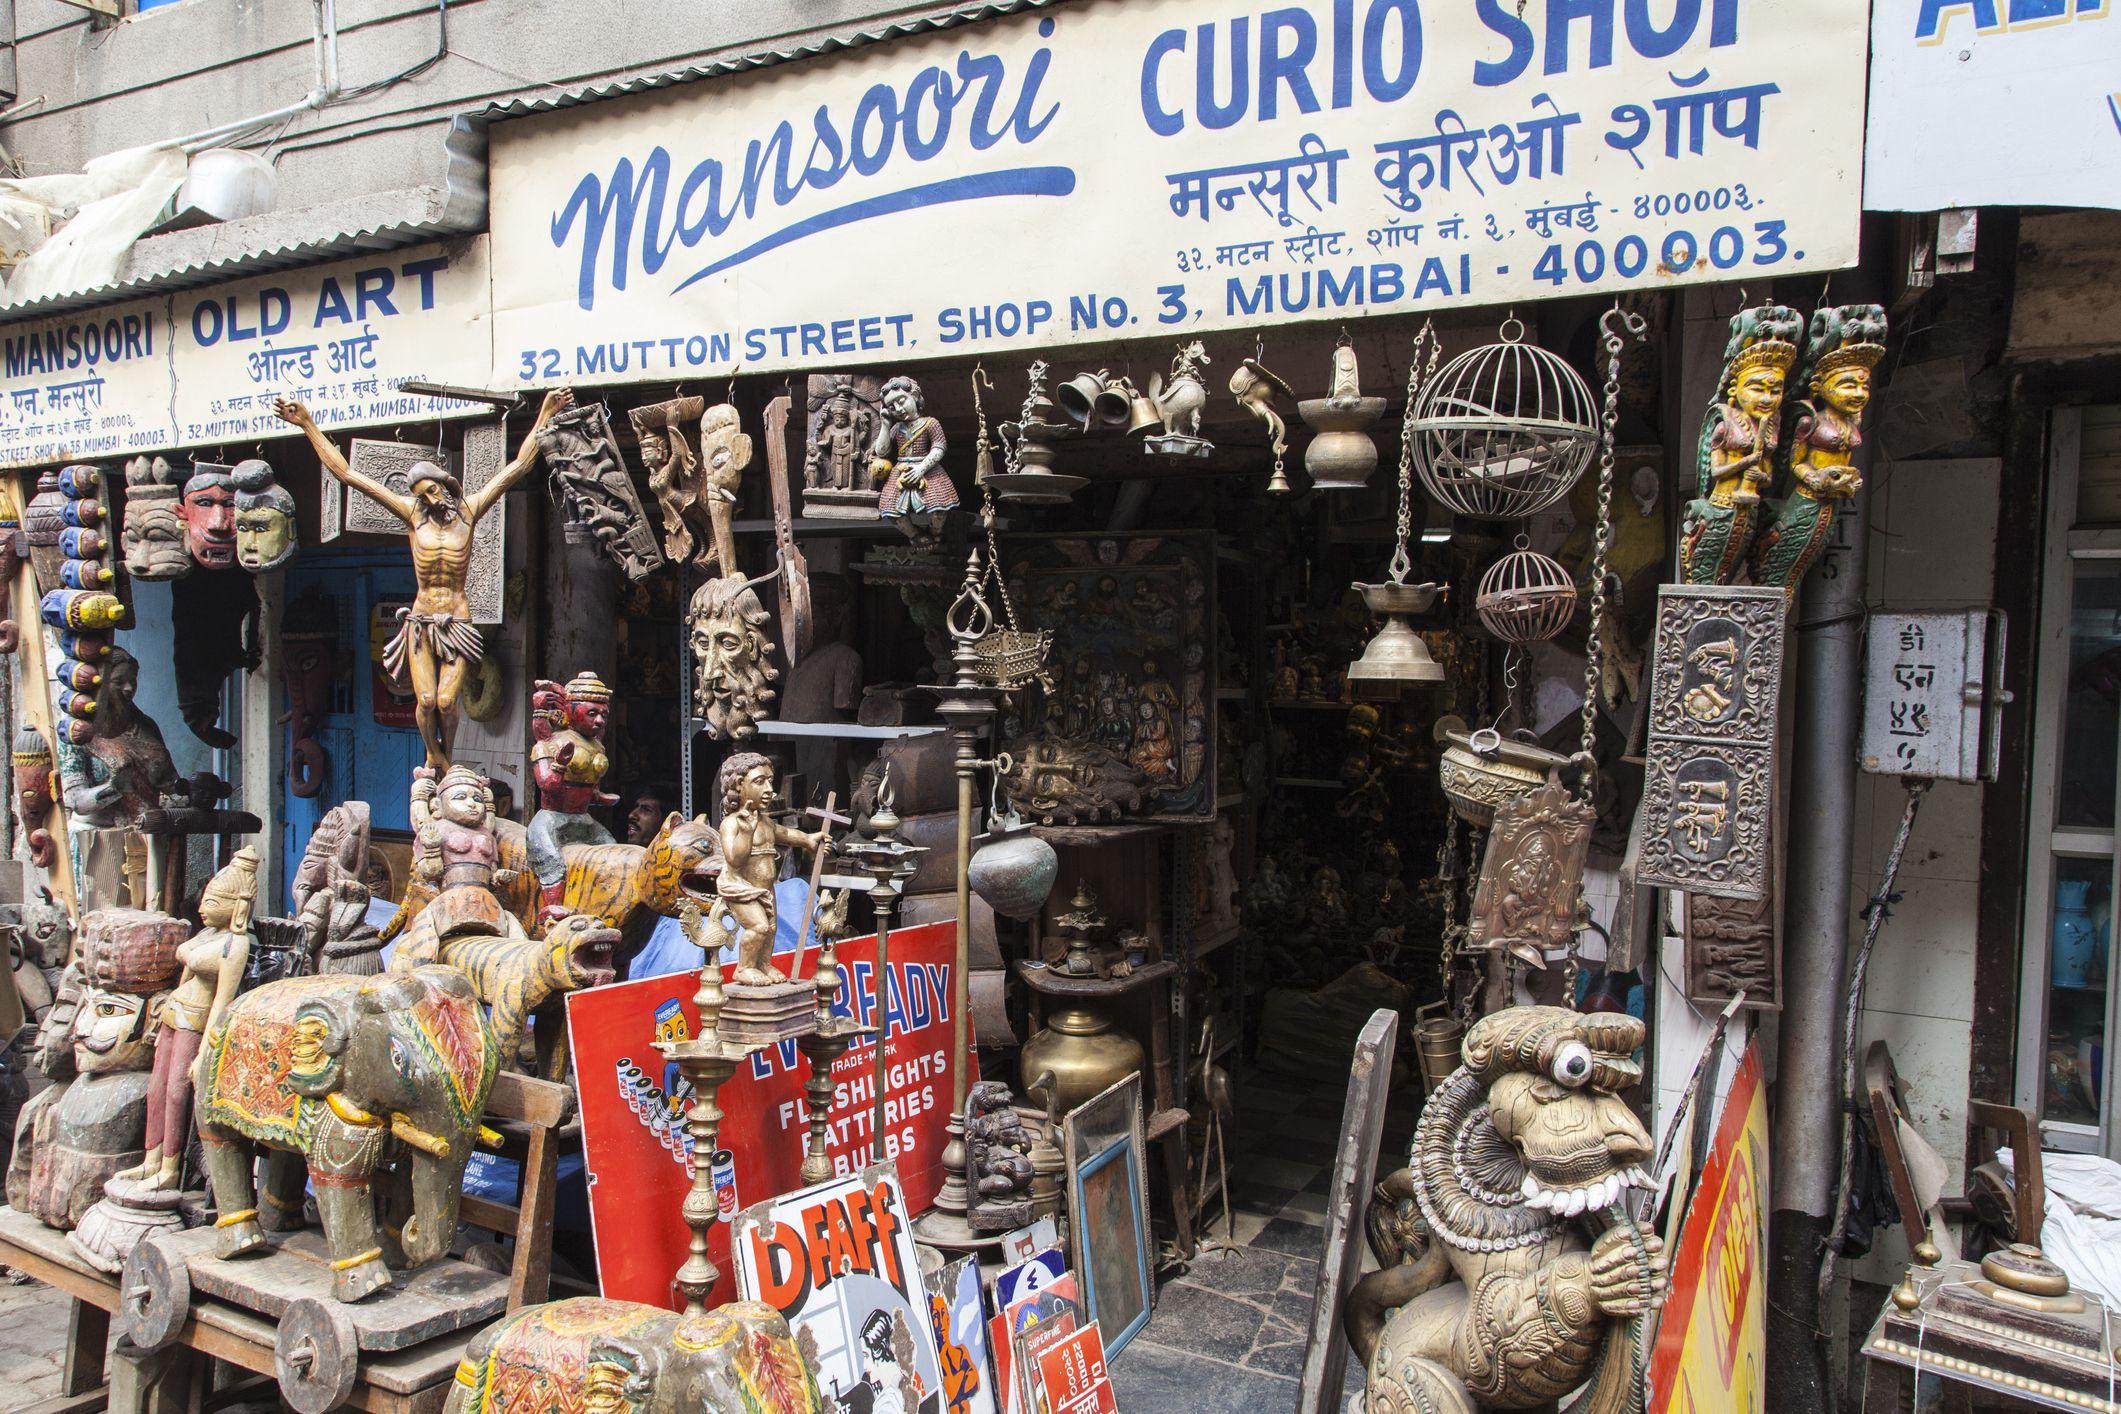 Chor Bazaar Handicrafts and old wares in an overflowing shop in historic Mutton Street, Chor Bazaar.